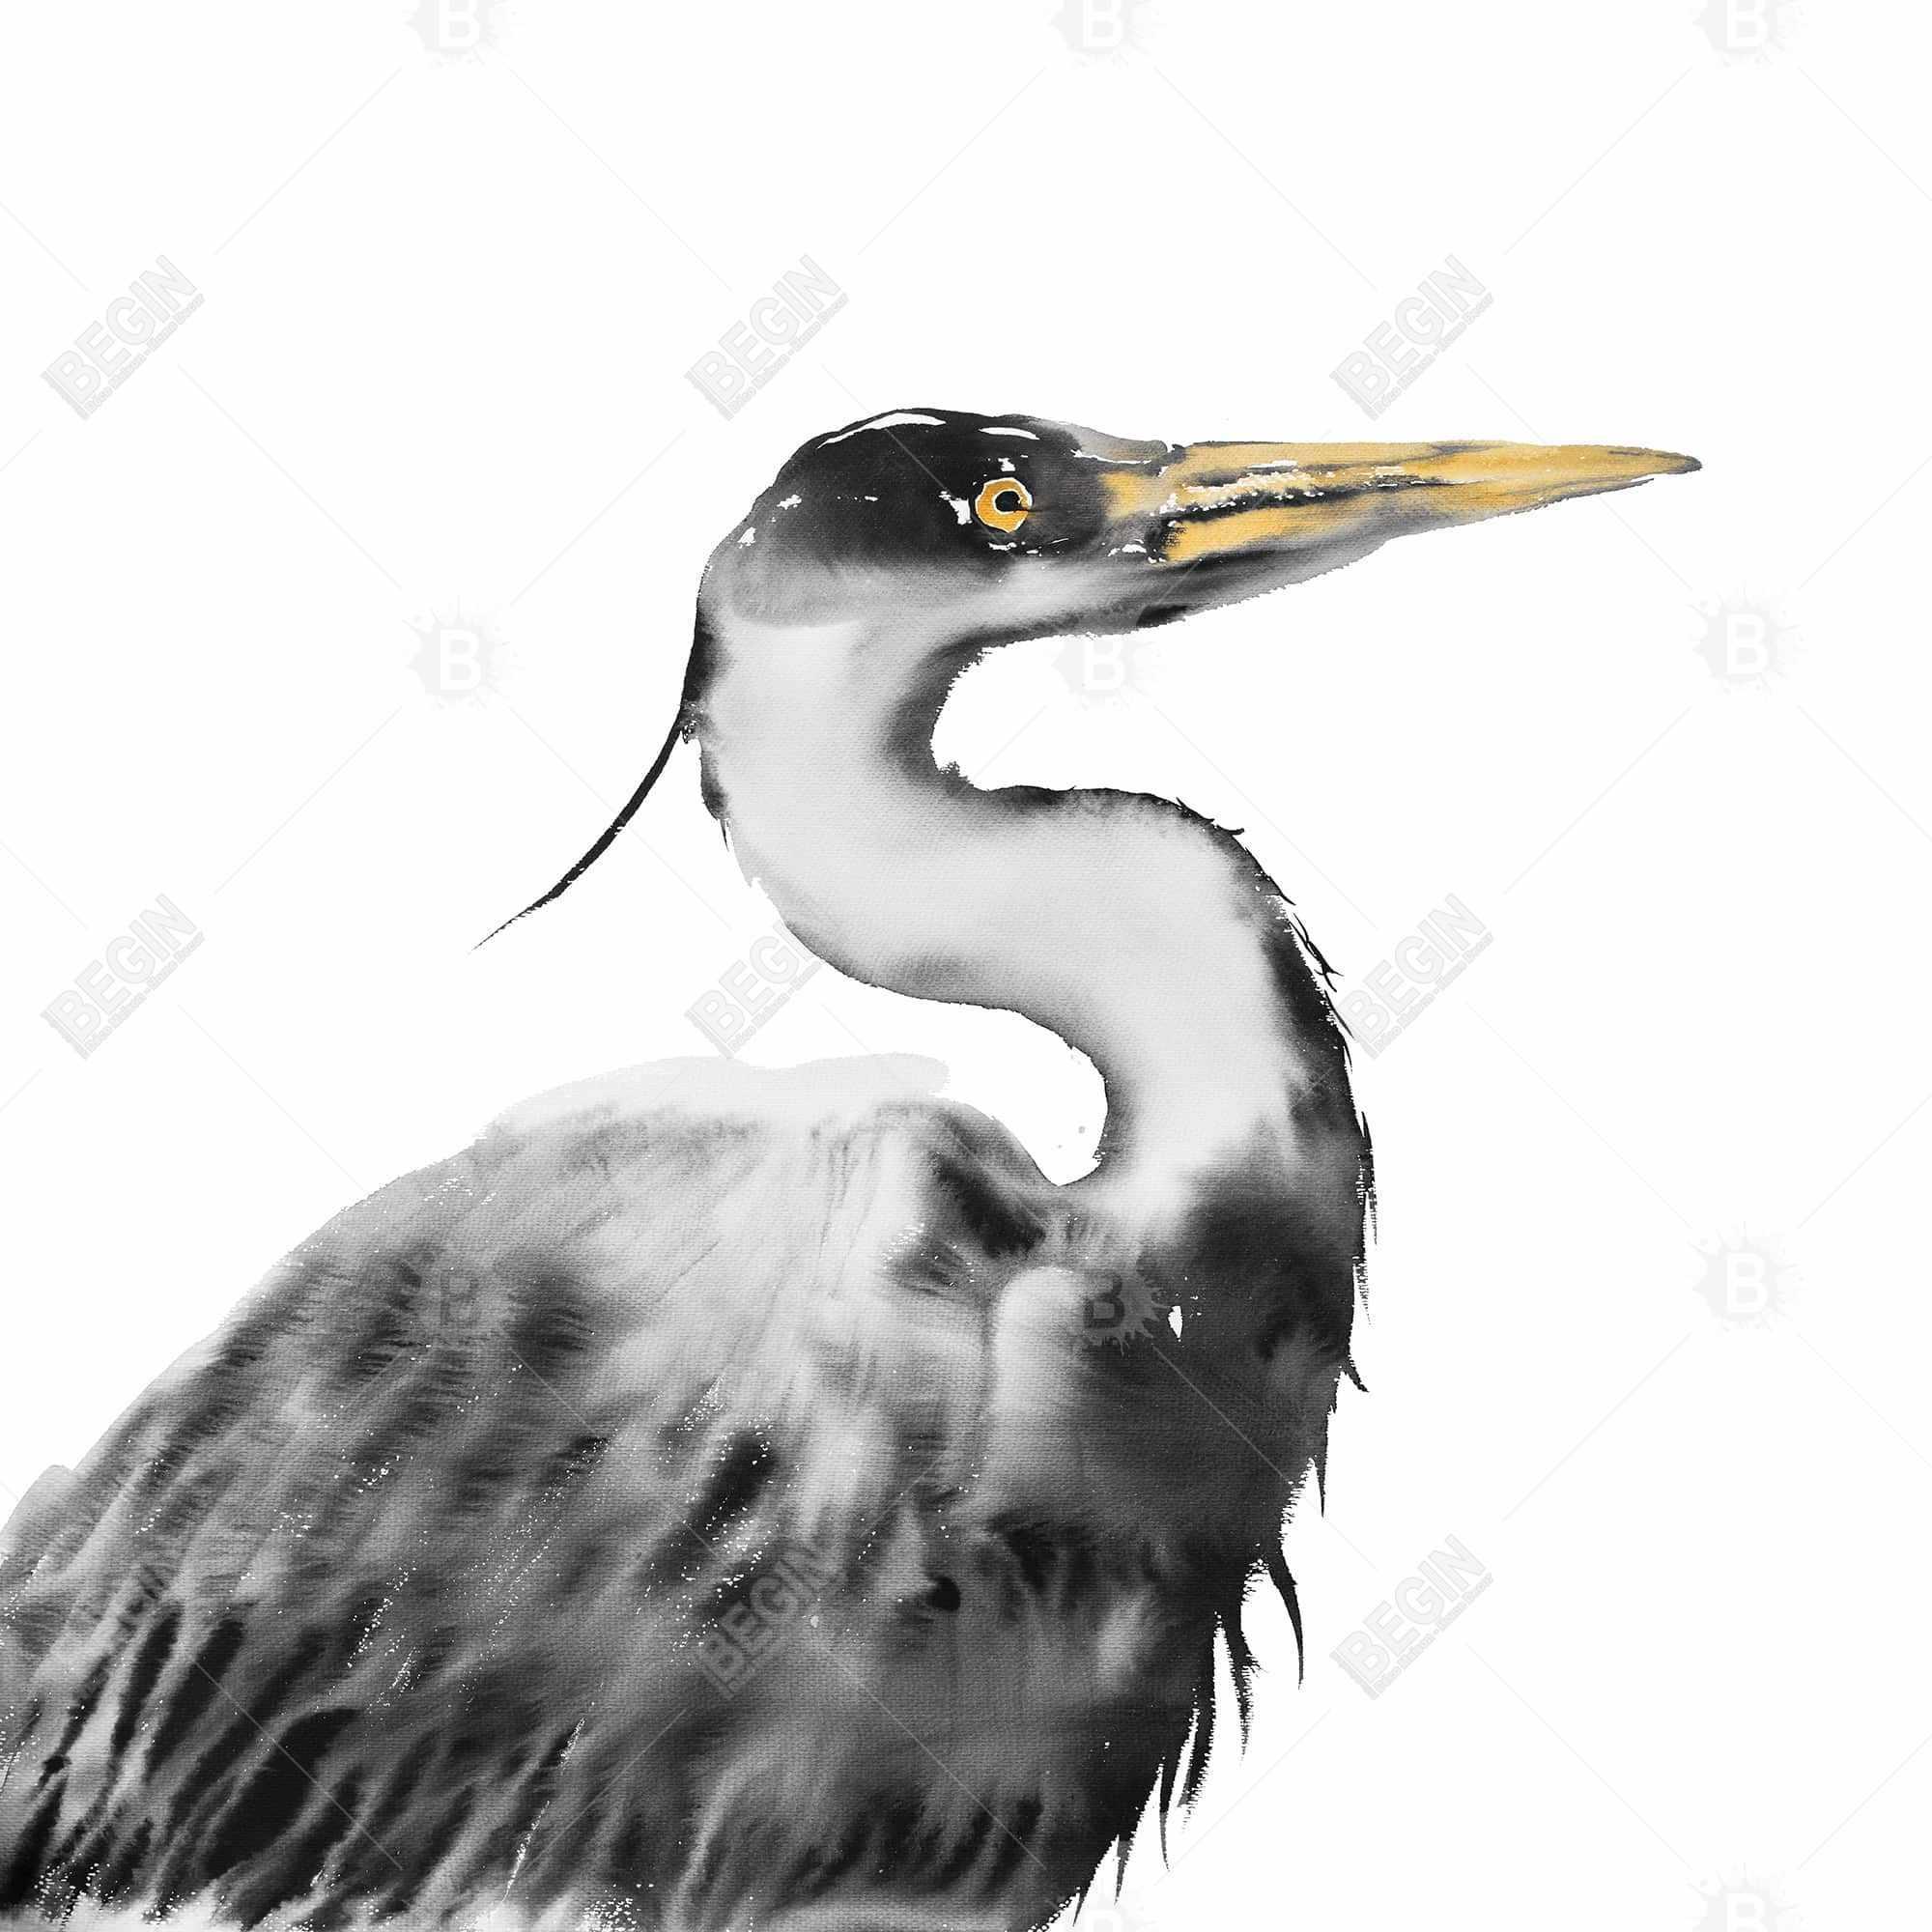 Great heron